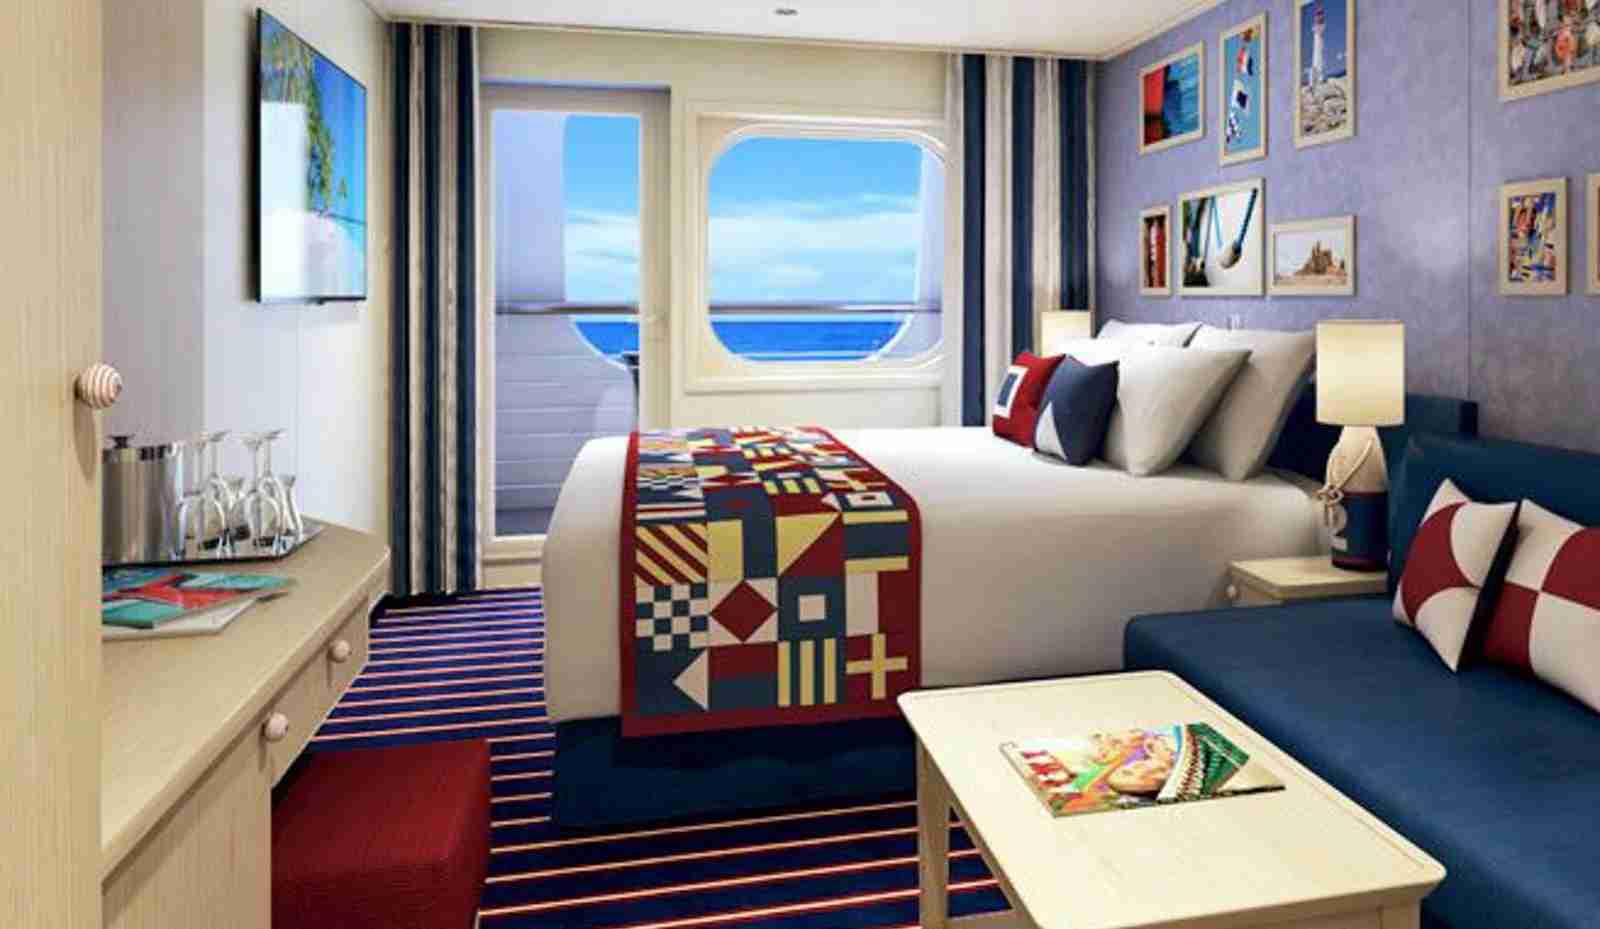 The Carnival Family Harbor room aboard the Carnival Vista. (Photo courtesy of Carnival Cruise Line Blog)